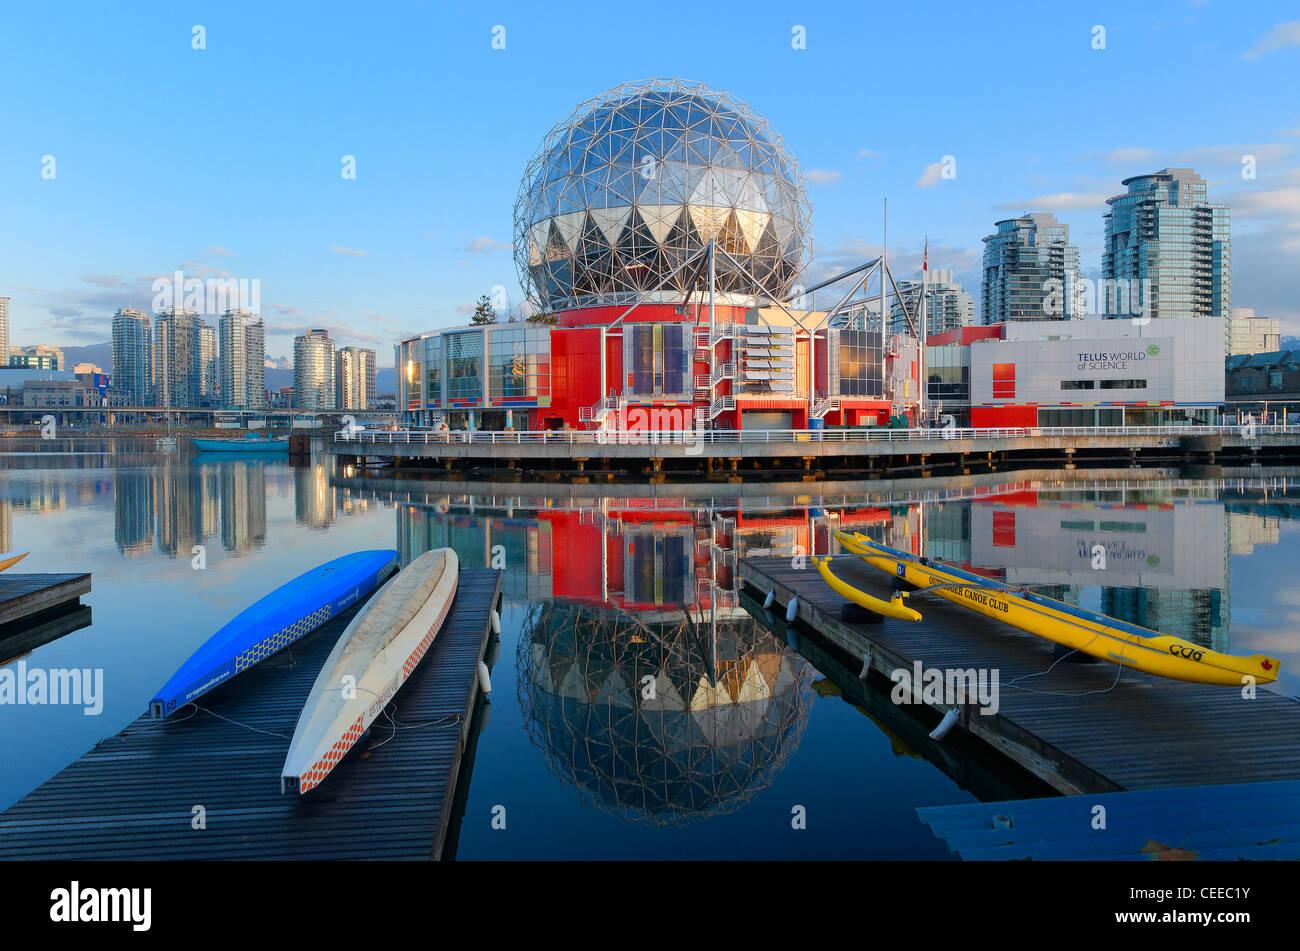 Welt der Wissenschaft, False Creek Vancouver British Columbia, Kanada Stockbild